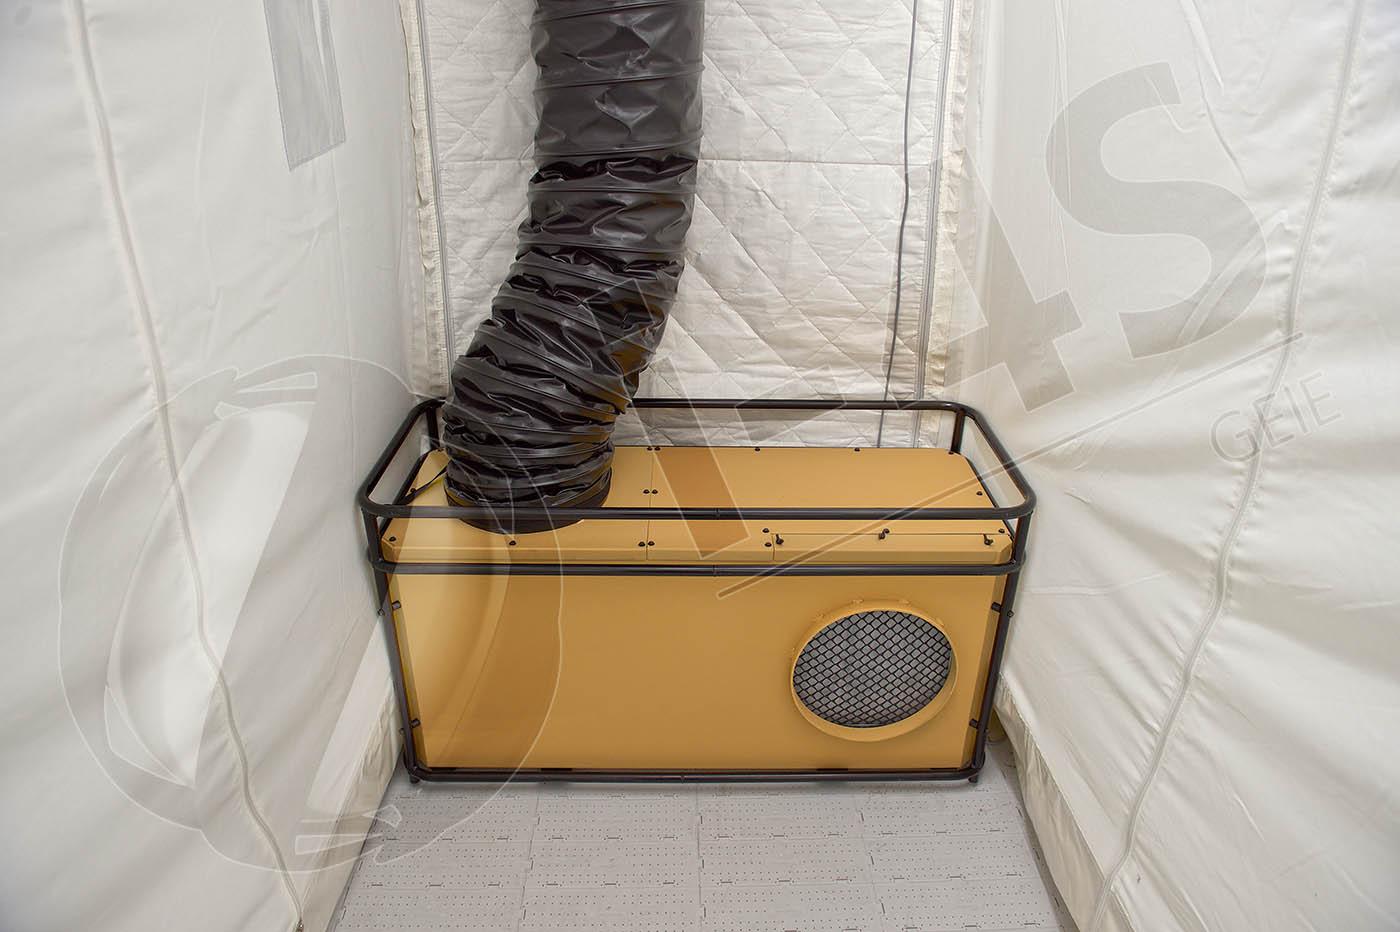 syst mes de climatisation et chauffage de tente i 4s innovation for shelter tente. Black Bedroom Furniture Sets. Home Design Ideas